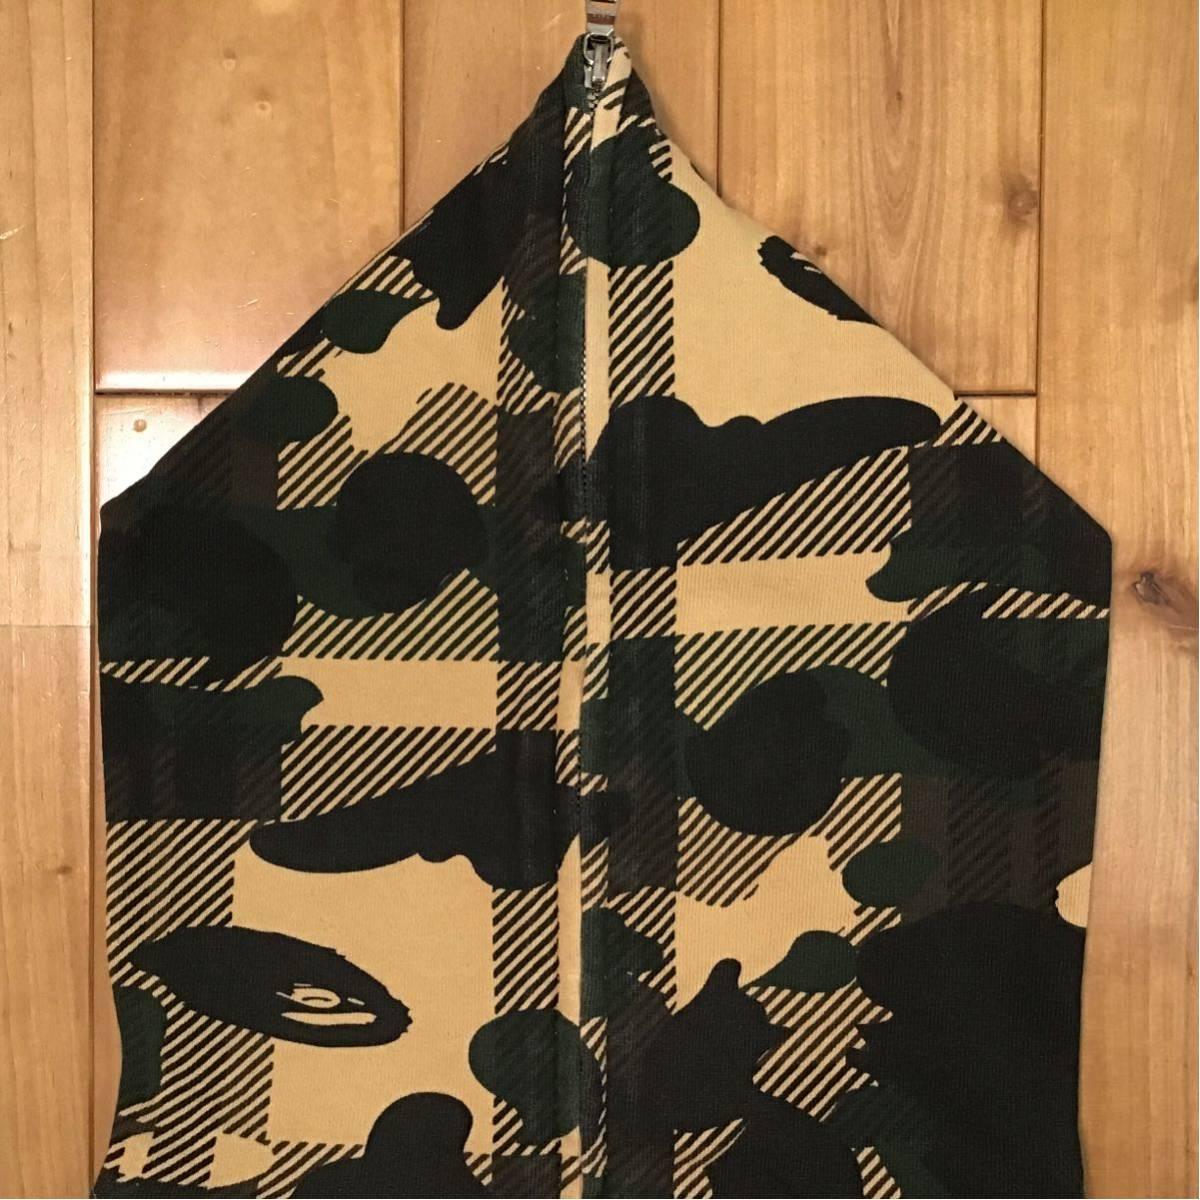 check camo フルジップ パーカー Mサイズ BAPE logo full zip hoodie a bathing ape エイプ ベイプ アベイシングエイプ 迷彩 g89